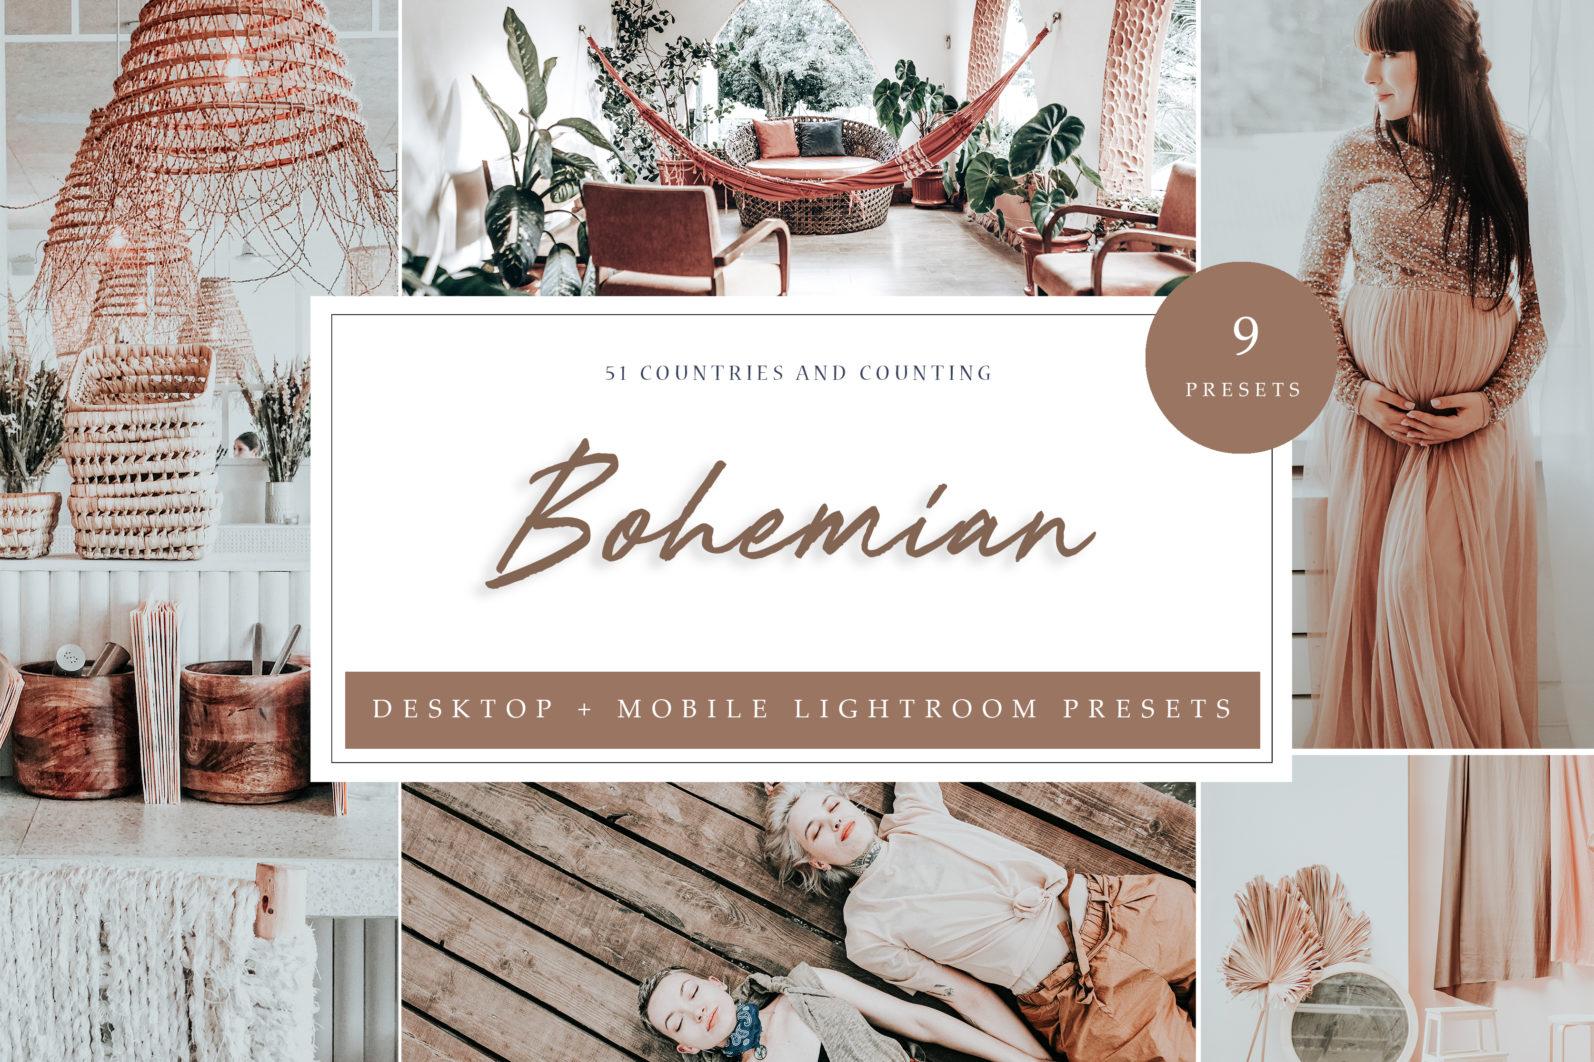 9 x Bohemian inspired lightroom presets   Desktop + Mobile - Bohemian LR scaled -